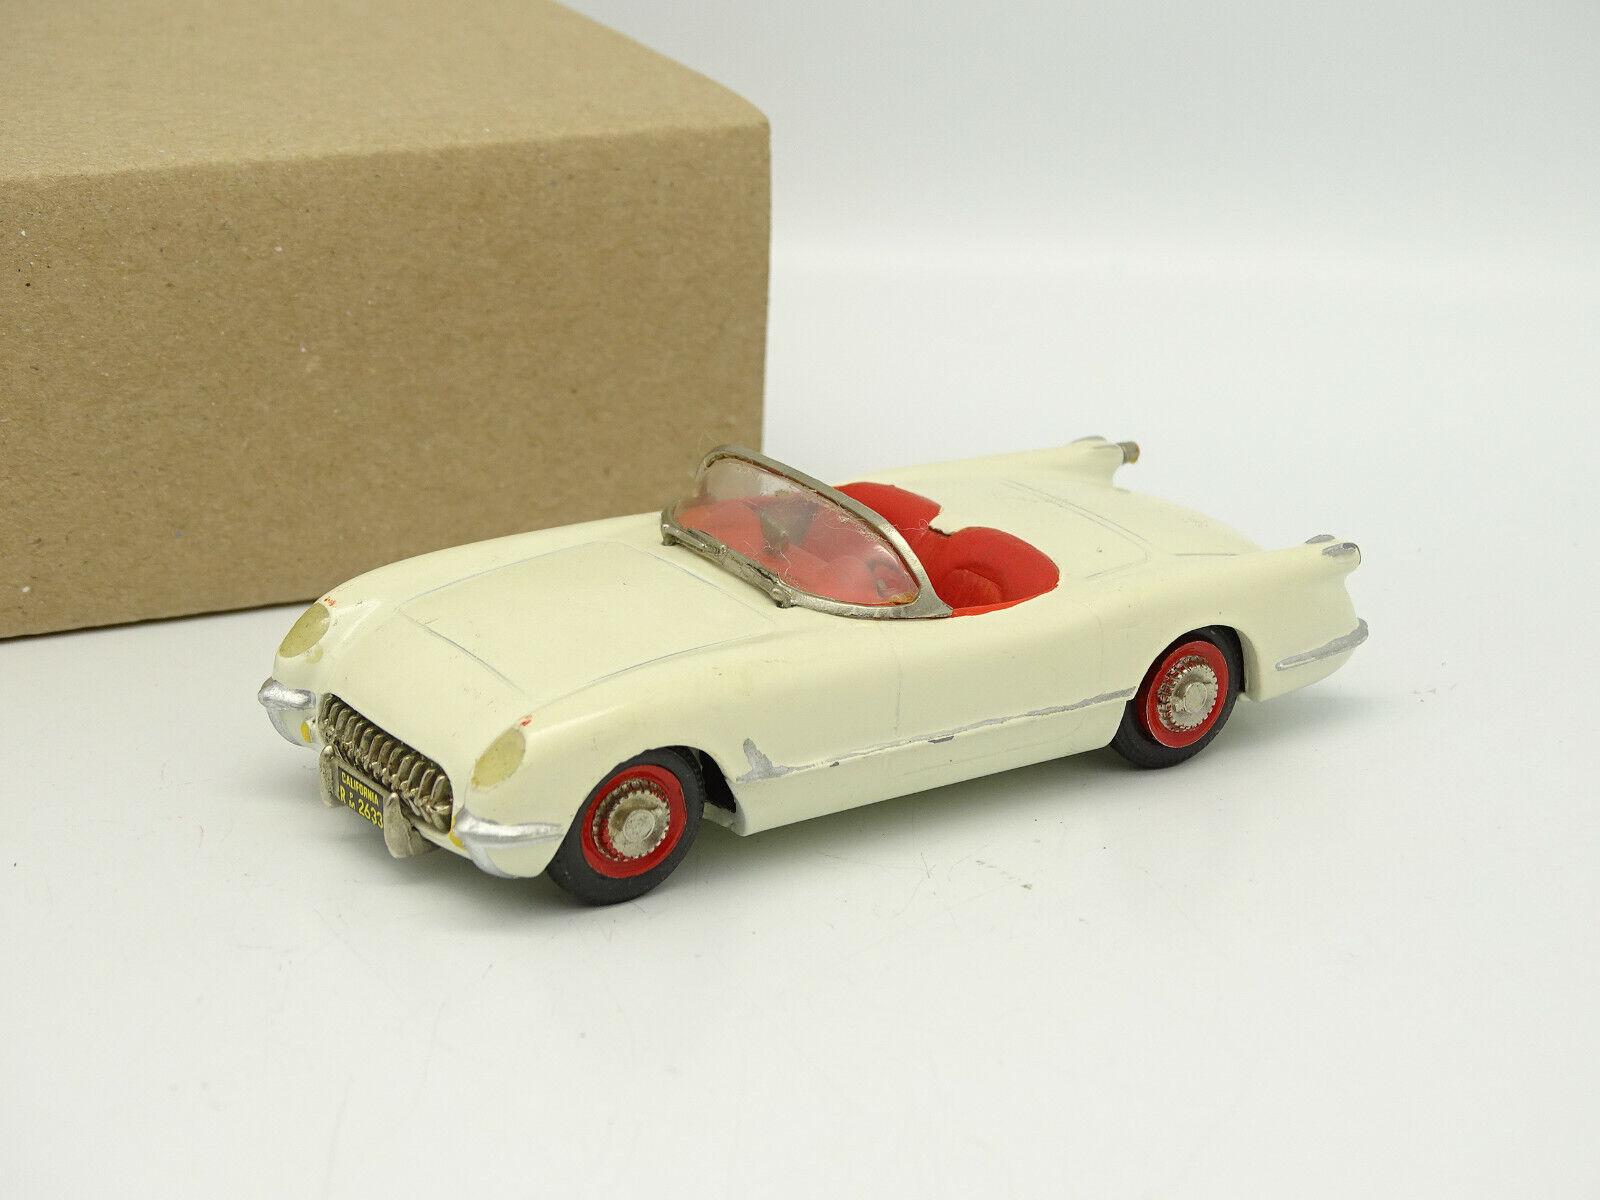 Precision Miniature Kit Mounted Metal 1 43 - 1953 Chevrolet Corvette